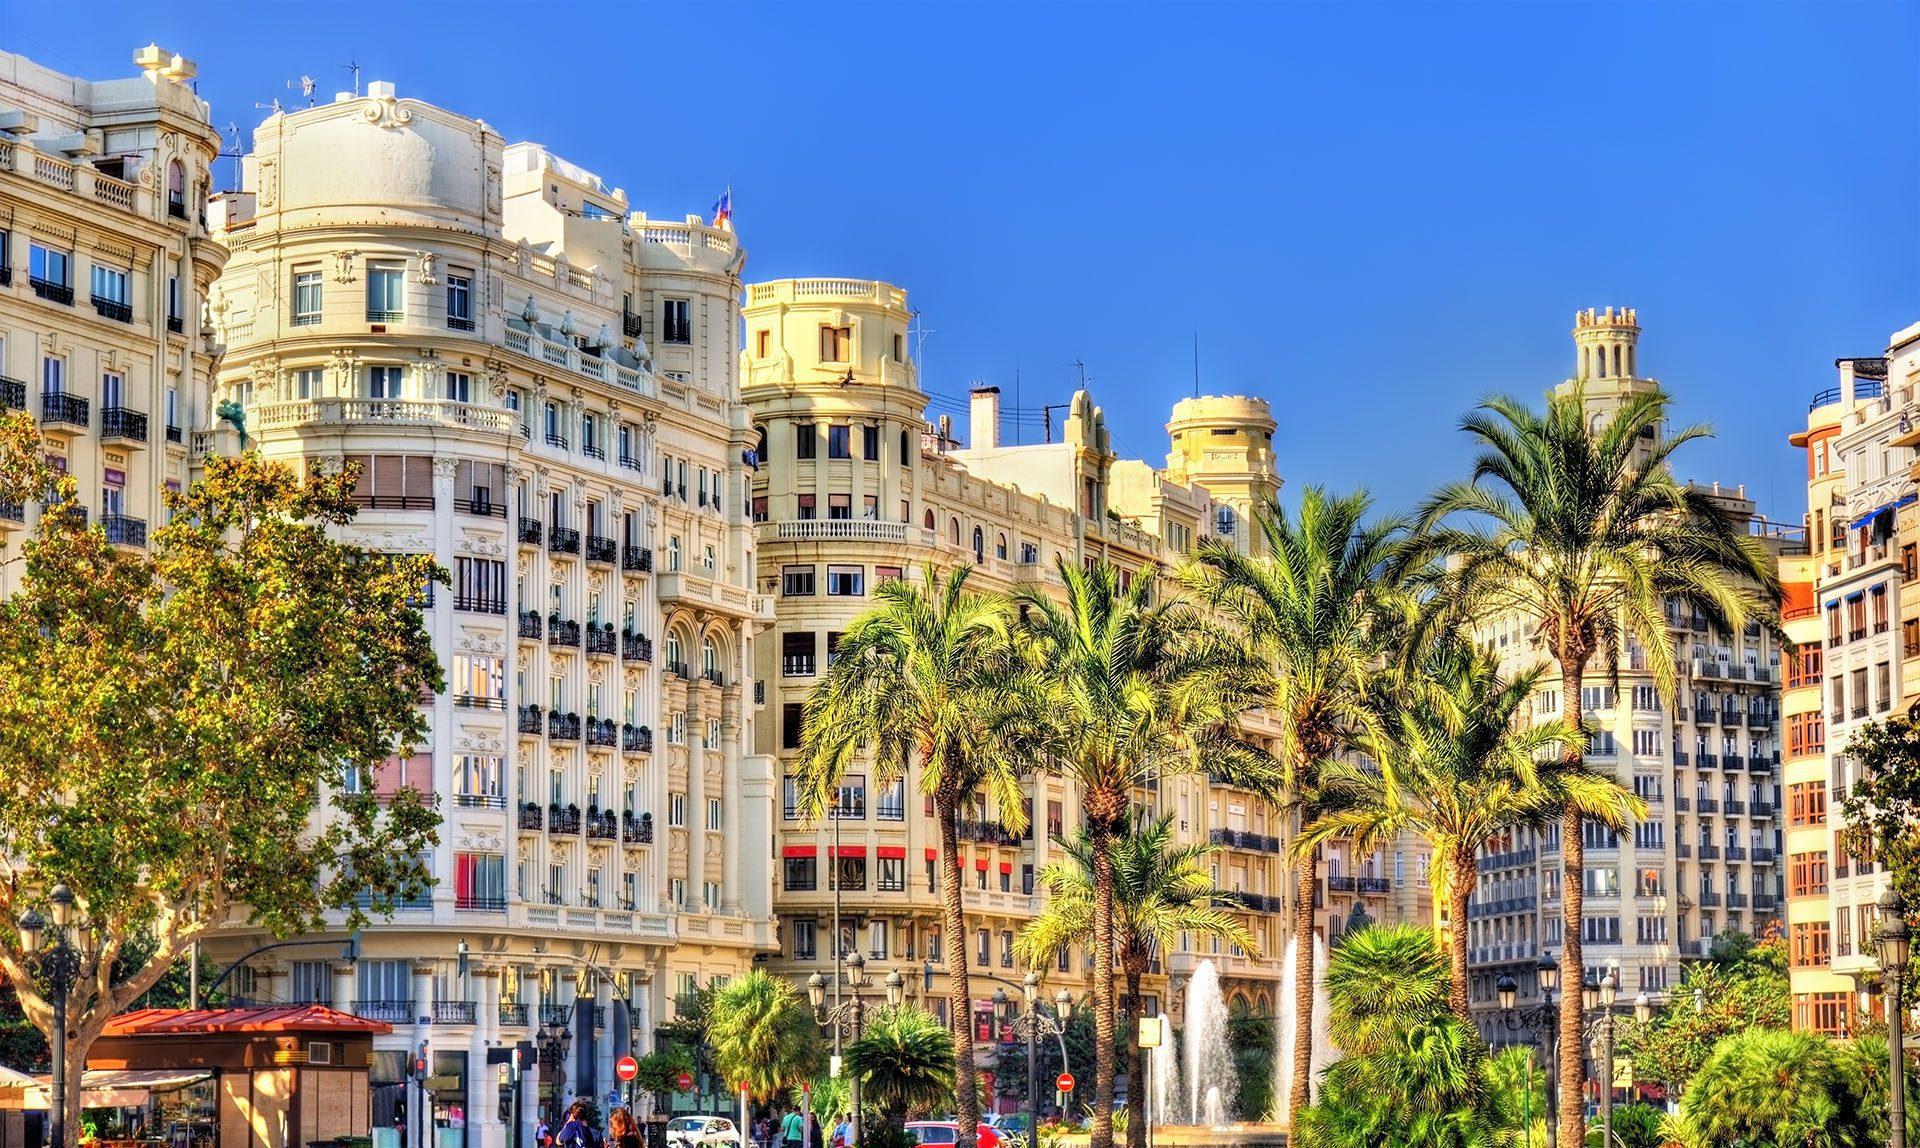 Visite gay de Valence